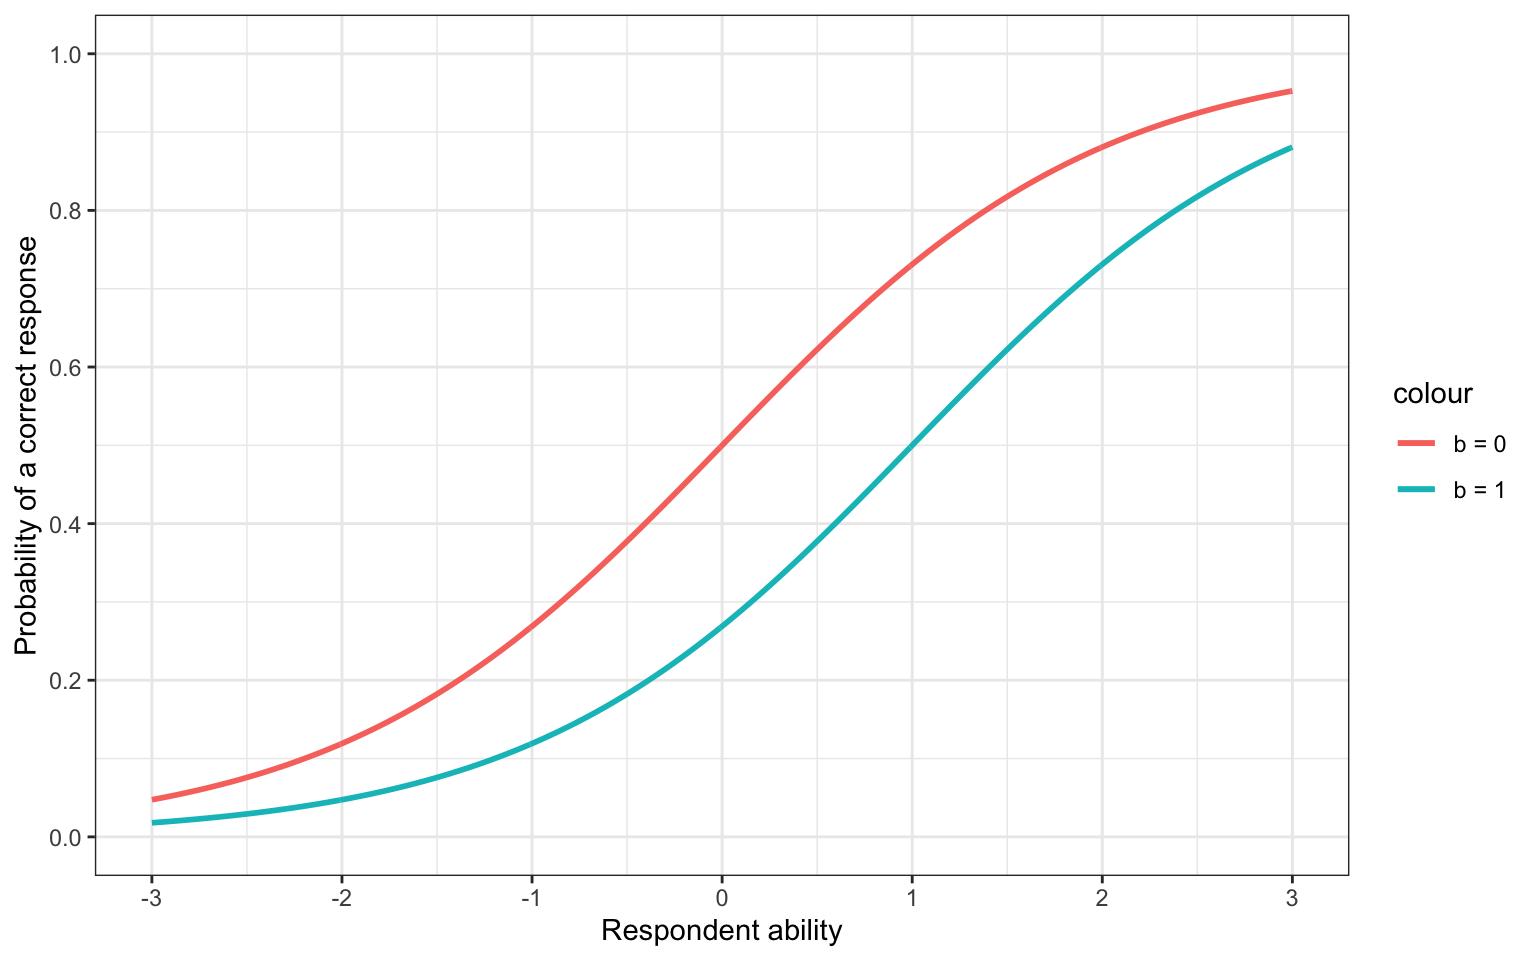 Shifting the b parameter